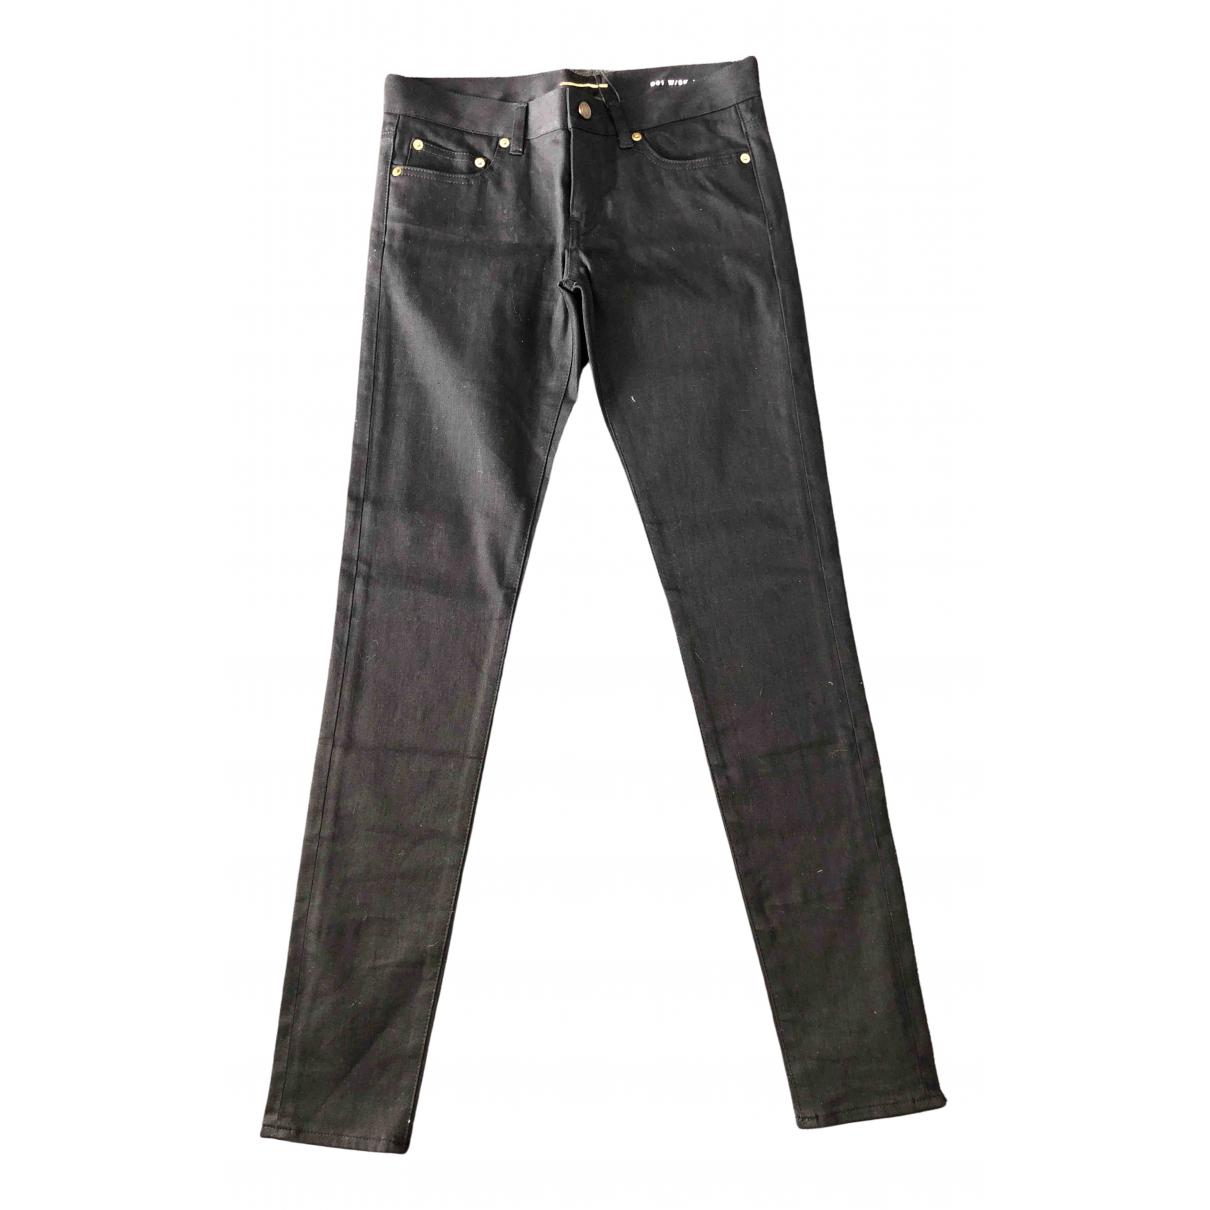 Saint Laurent \N Black Denim - Jeans Trousers for Women 38 FR